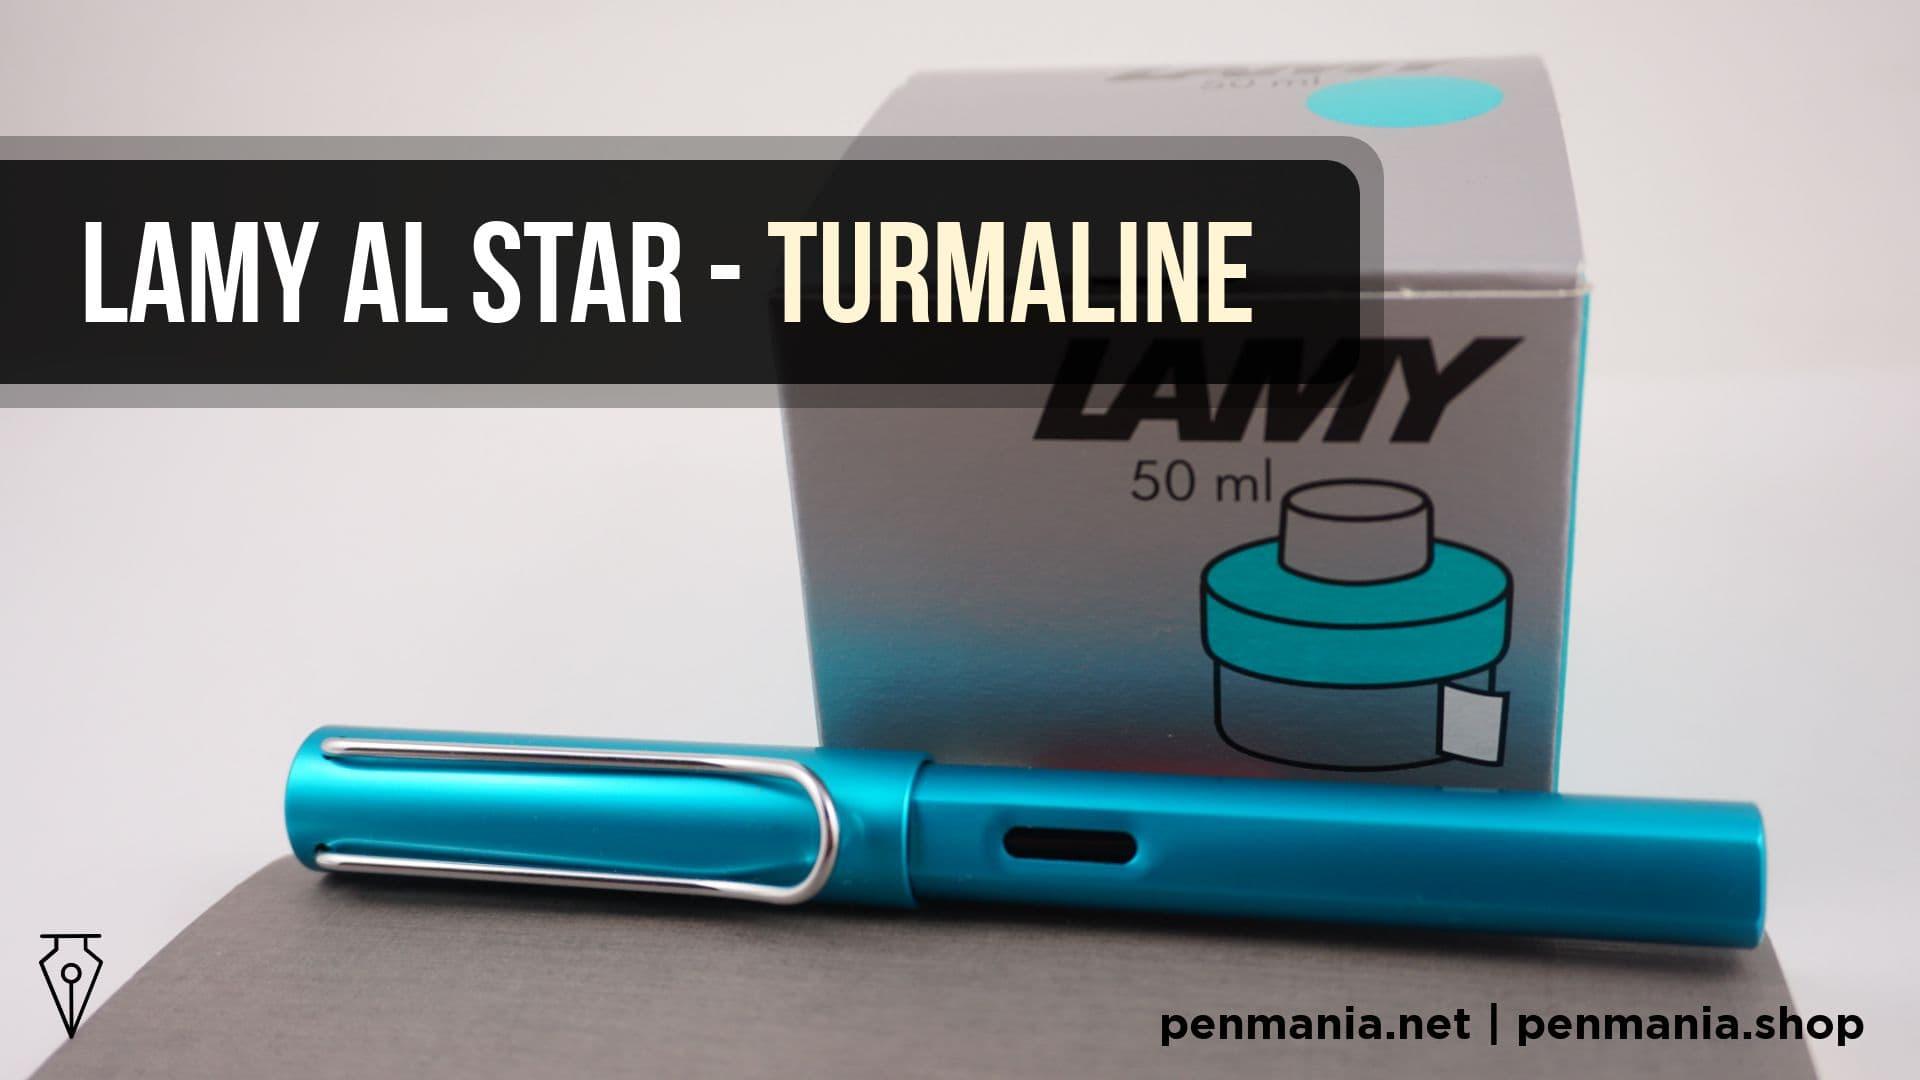 Coperta Video Recenzie Lamy Al Star Turmalina Penmania Shop